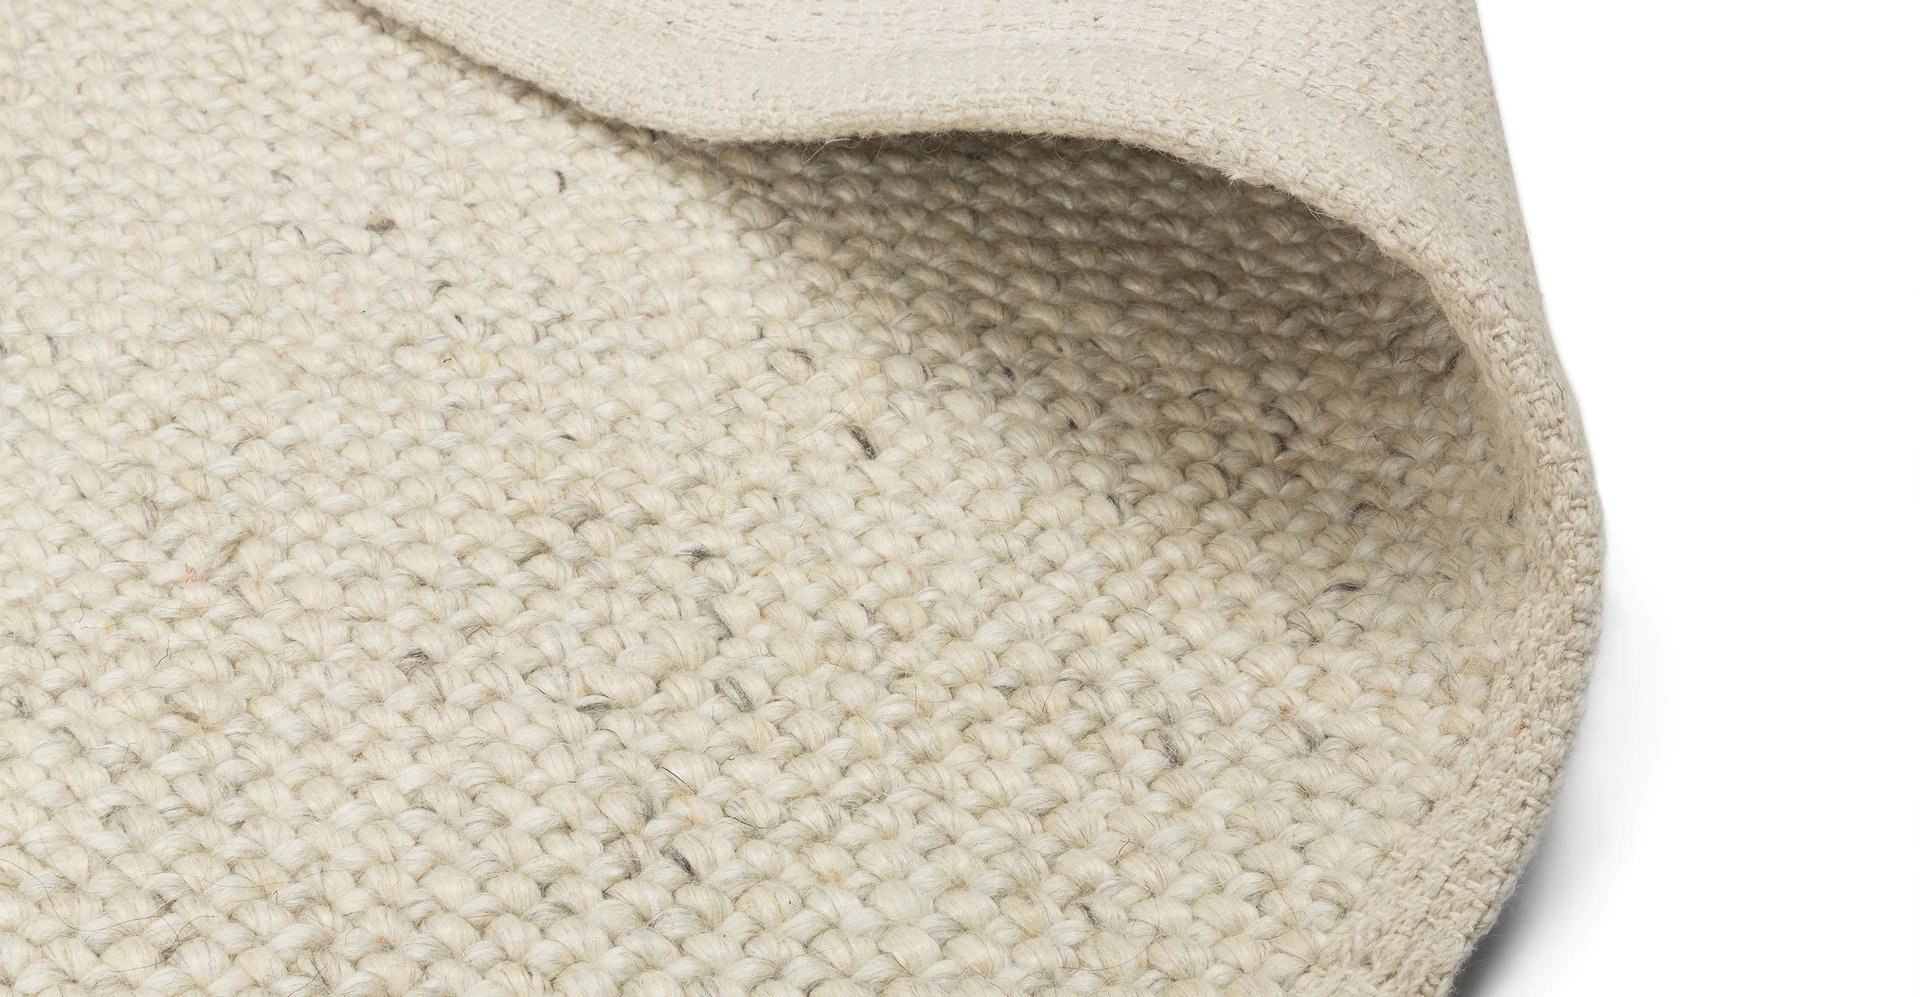 Texa Vanilla Ivory Rug 8 x 10